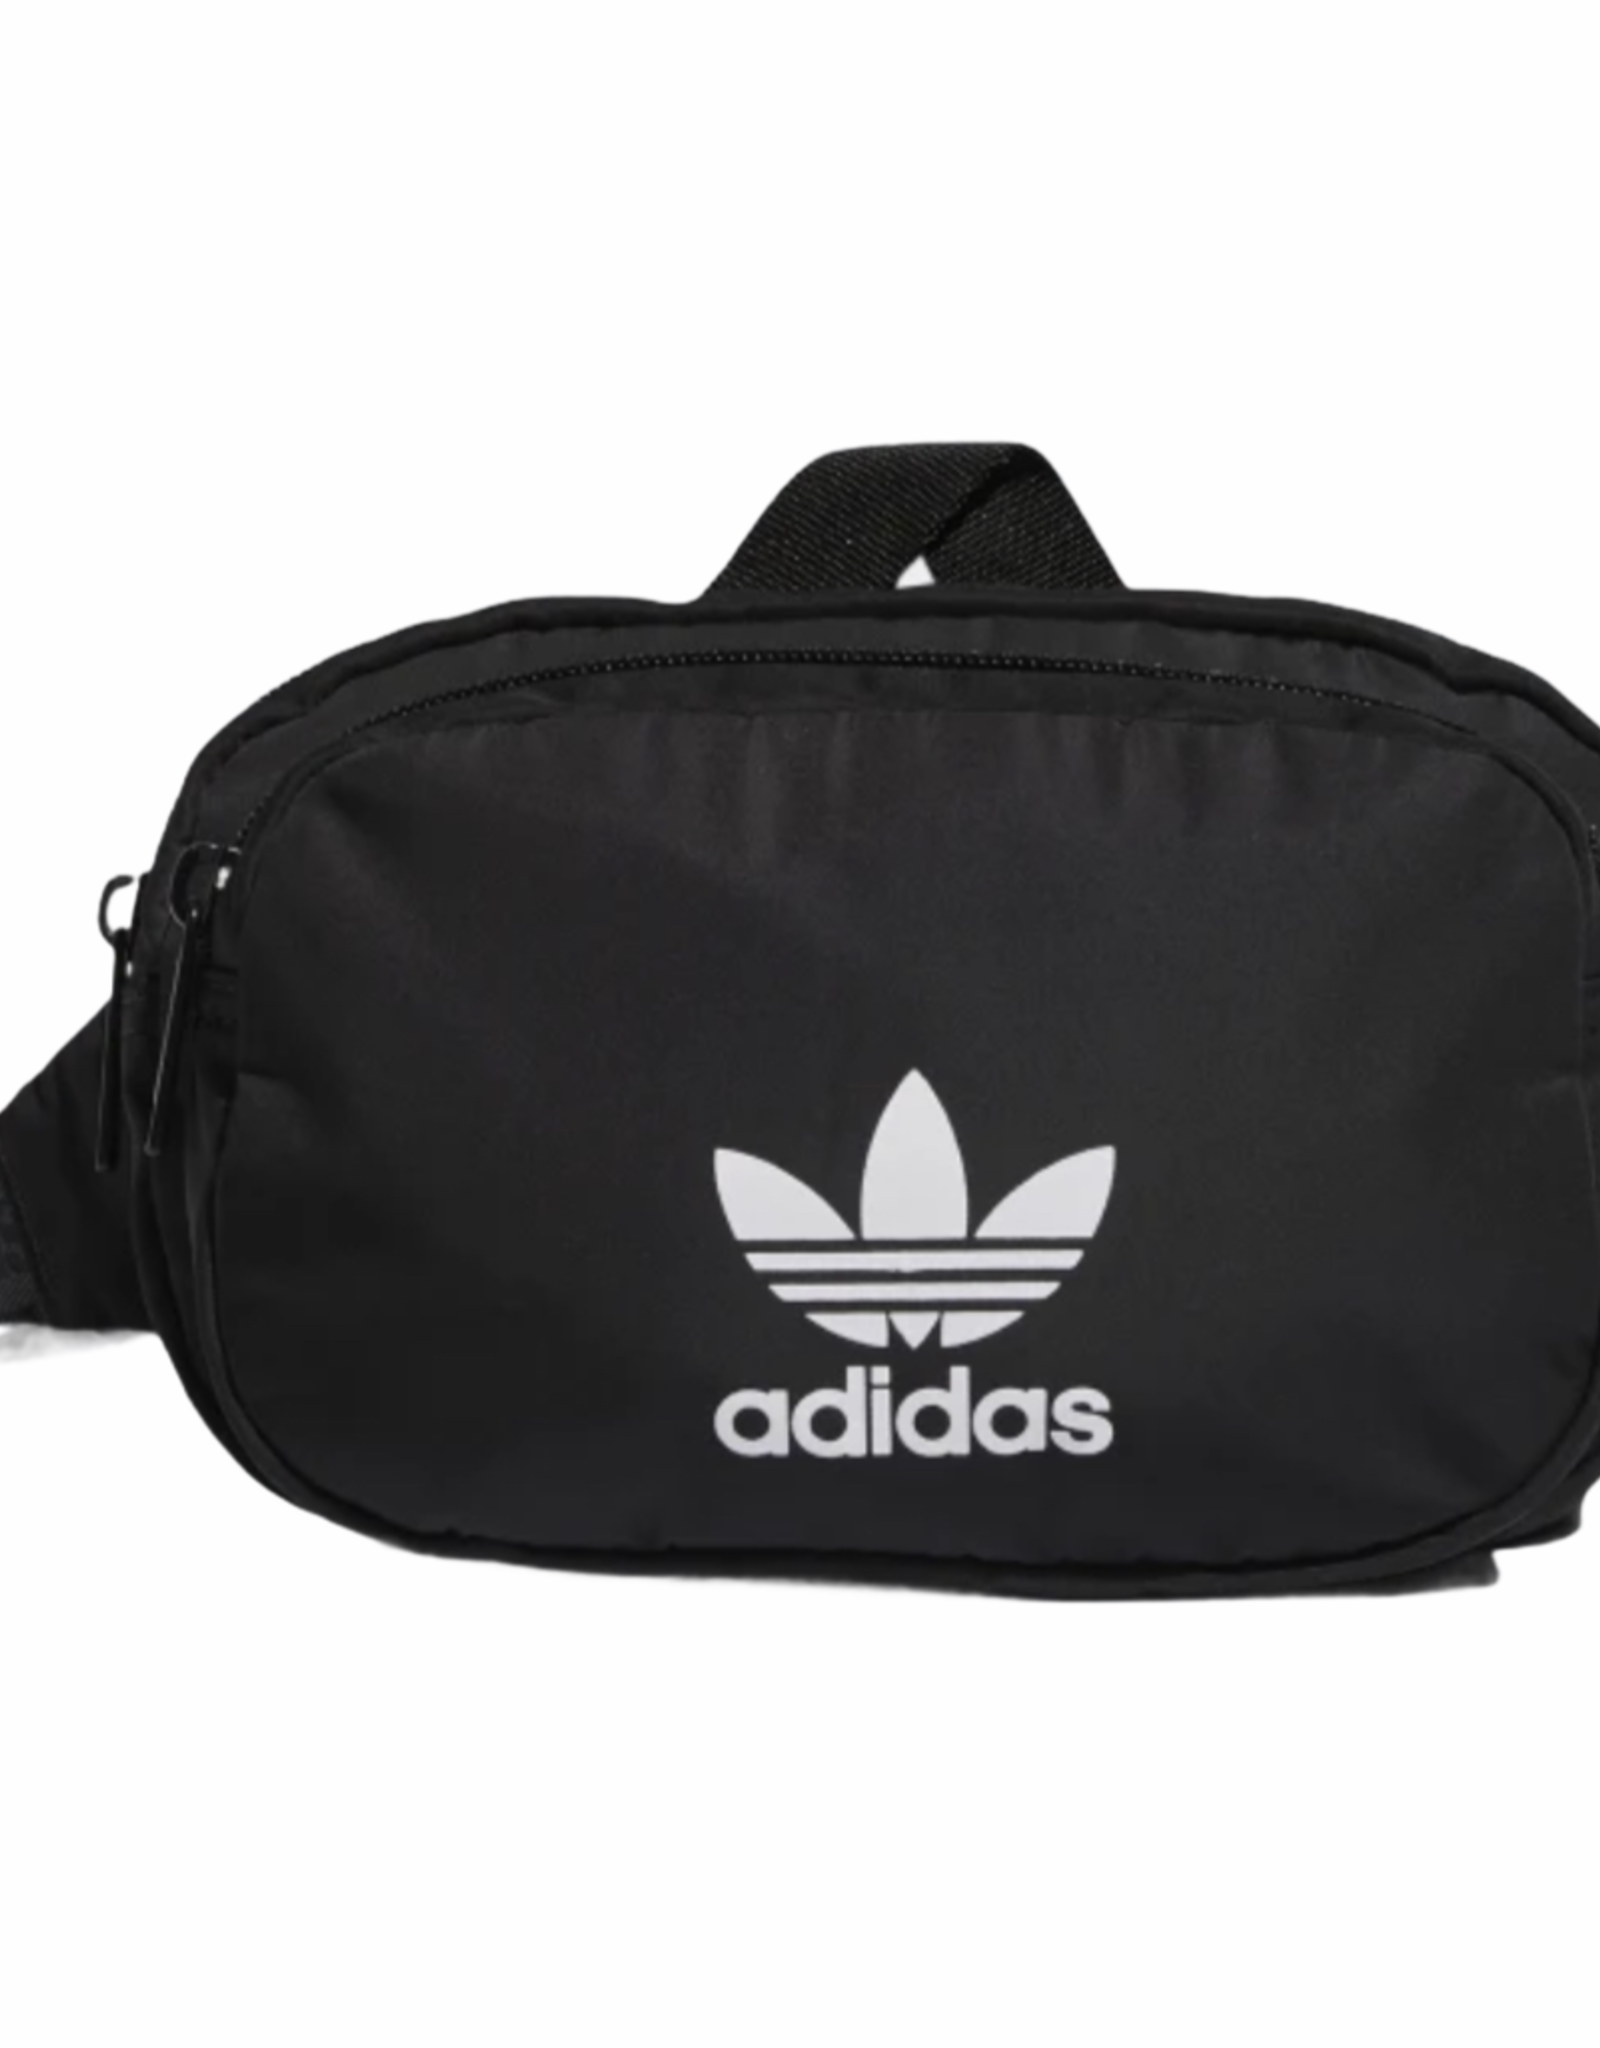 Adidas Adidas Sport Waist Trefoil Fanny Pack